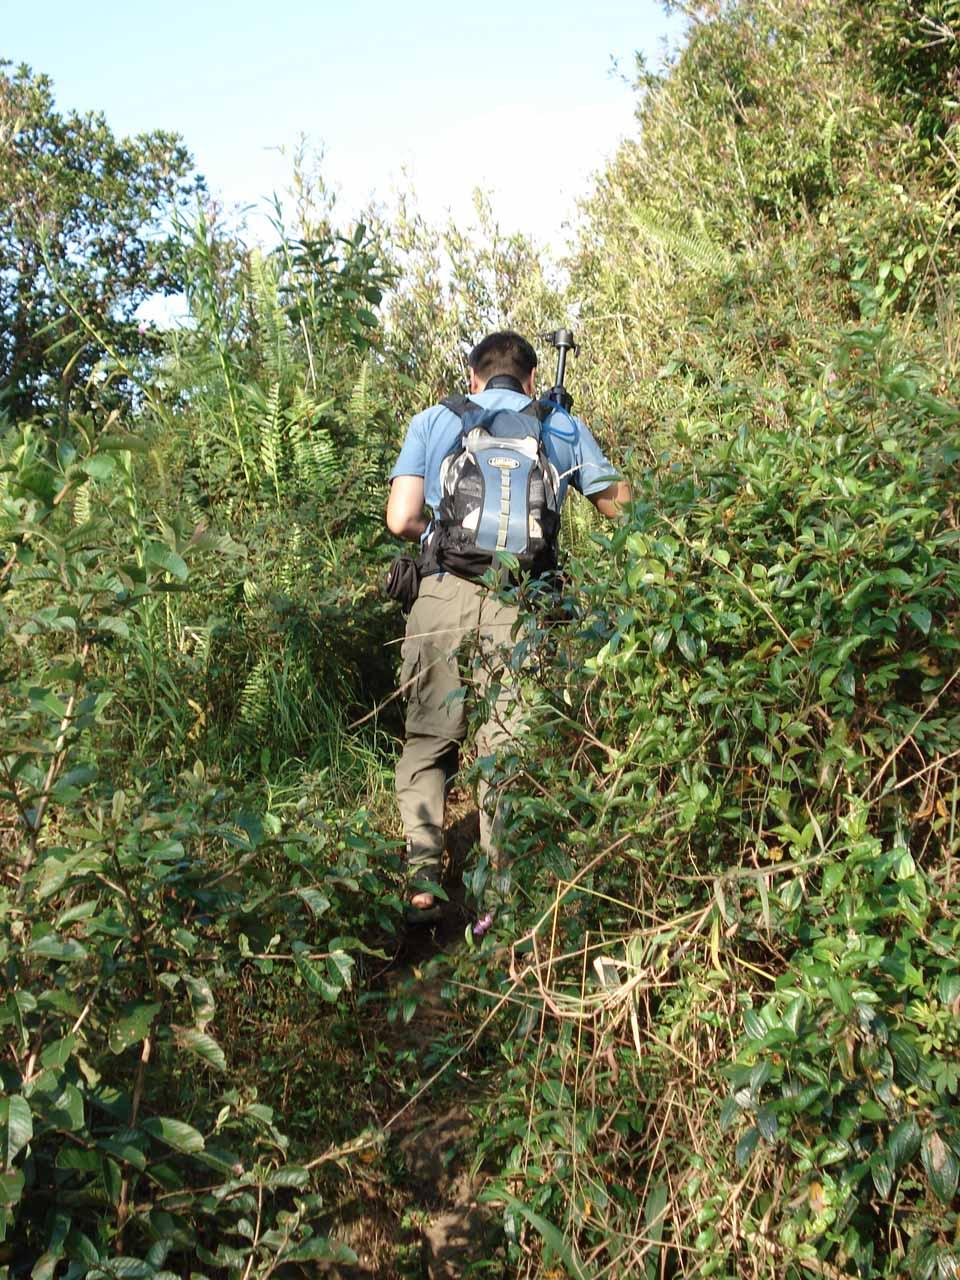 Me scrambling through the overgrowth